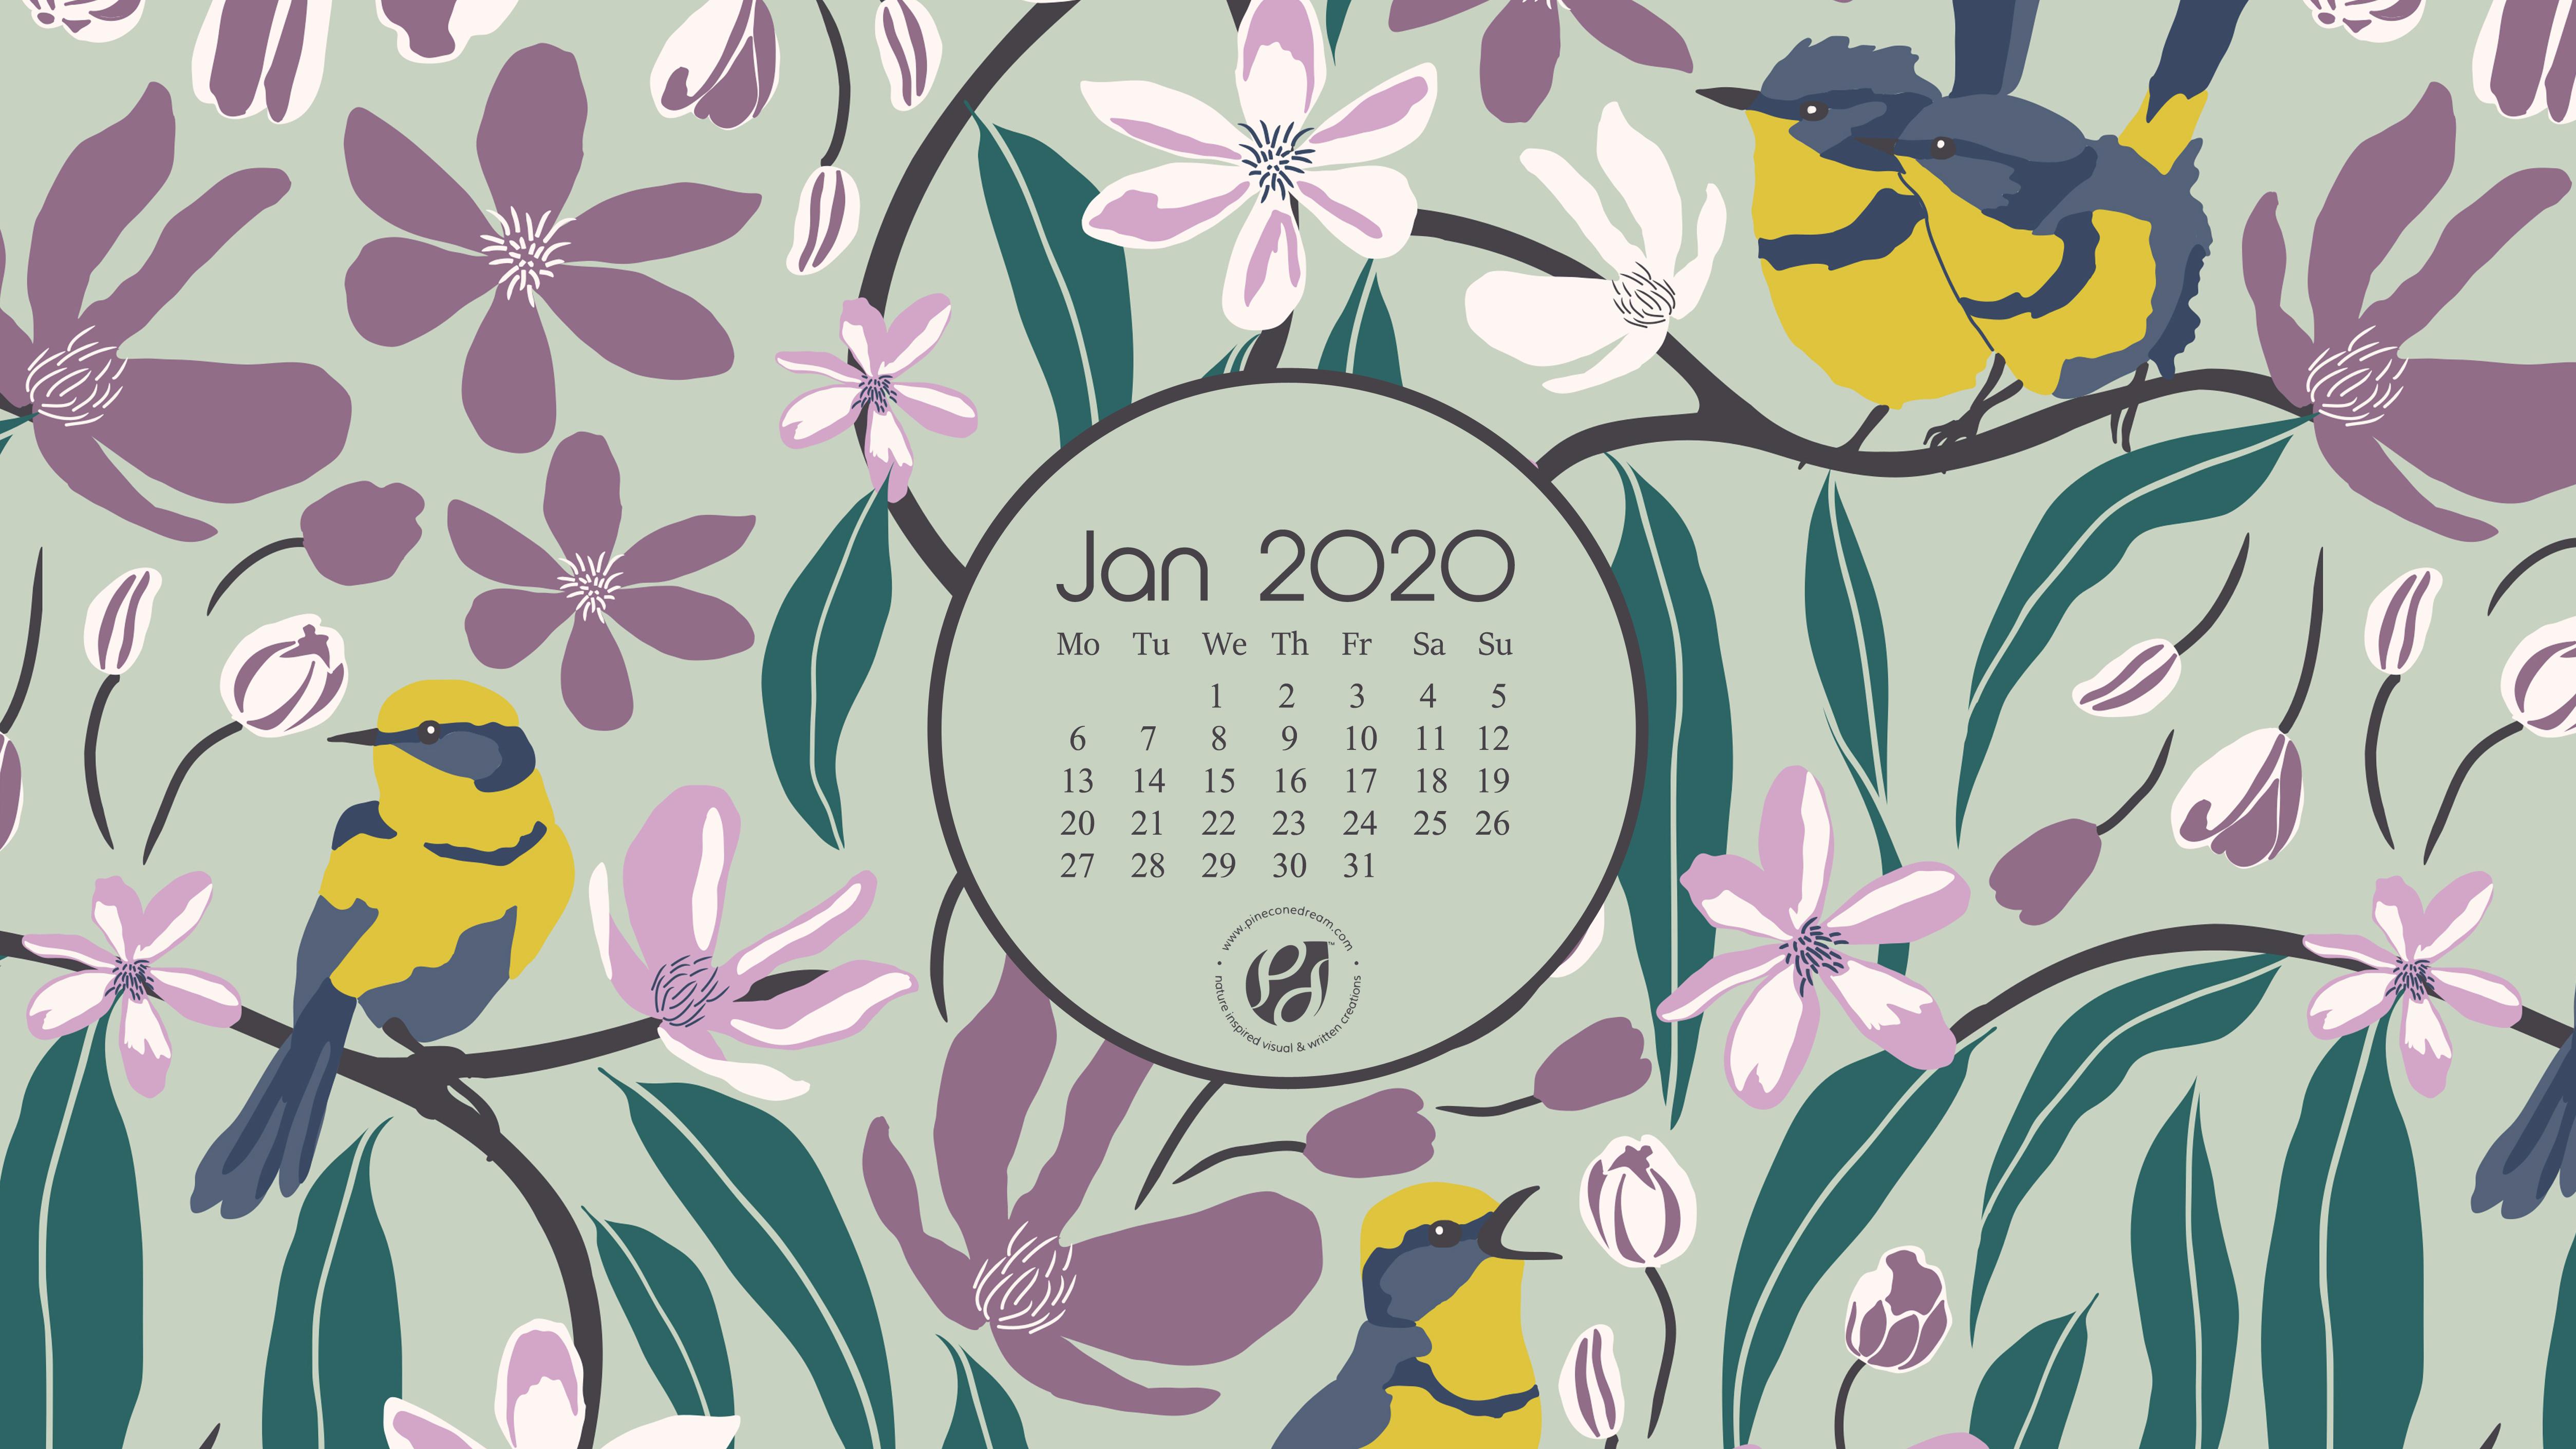 Jan 2020 Free Calendar Wallpapers Printable Planner Illustrated